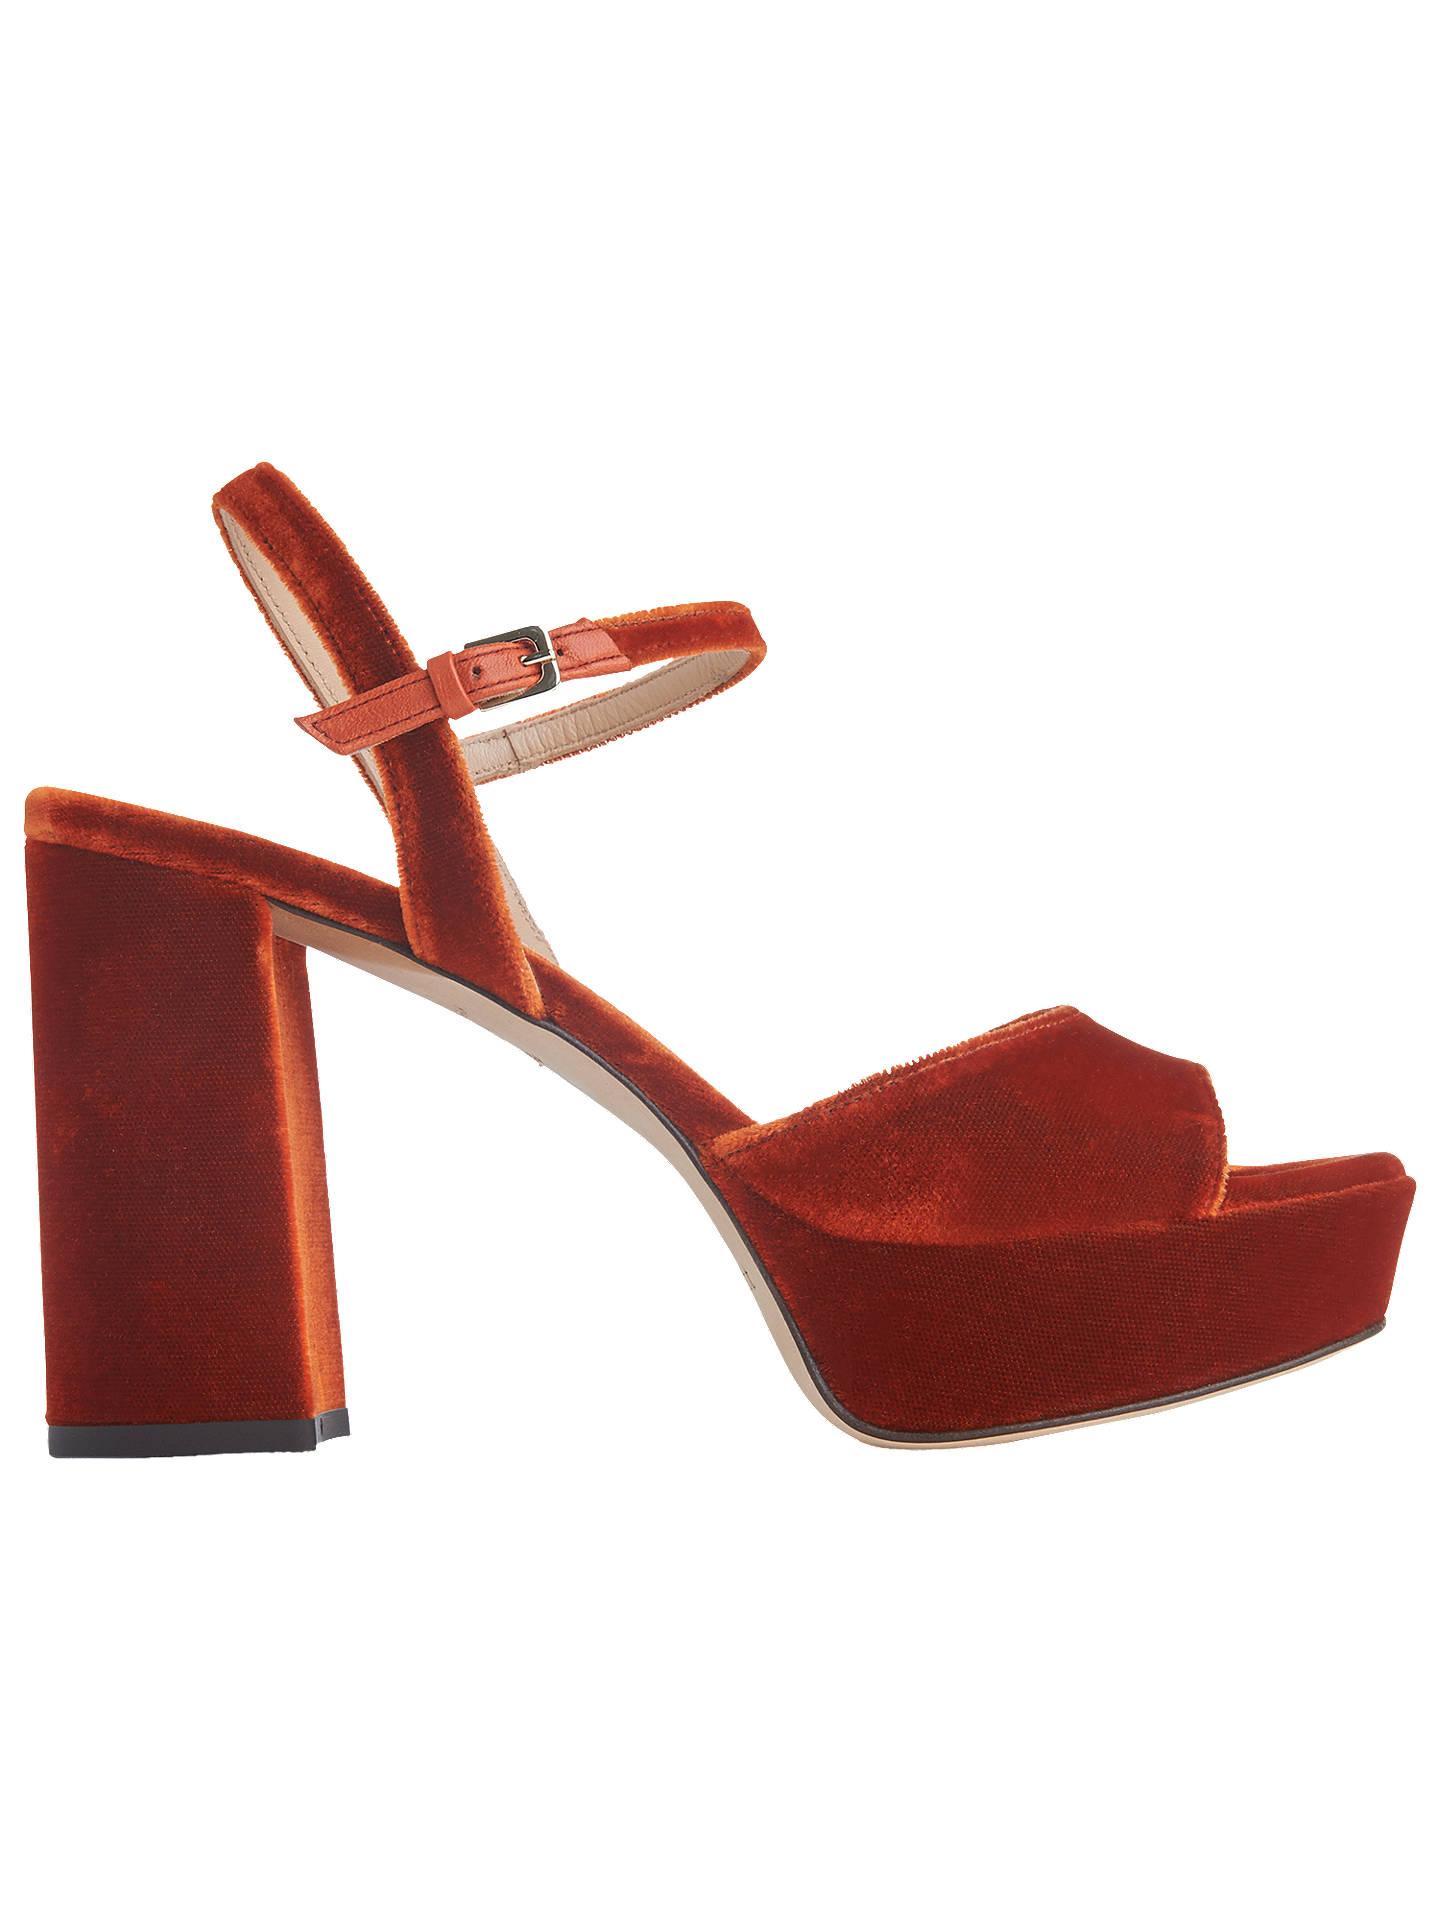 b6b0f5a9df4 L.K.Bennett Henie High Block Heel Sandals at John Lewis & Partners